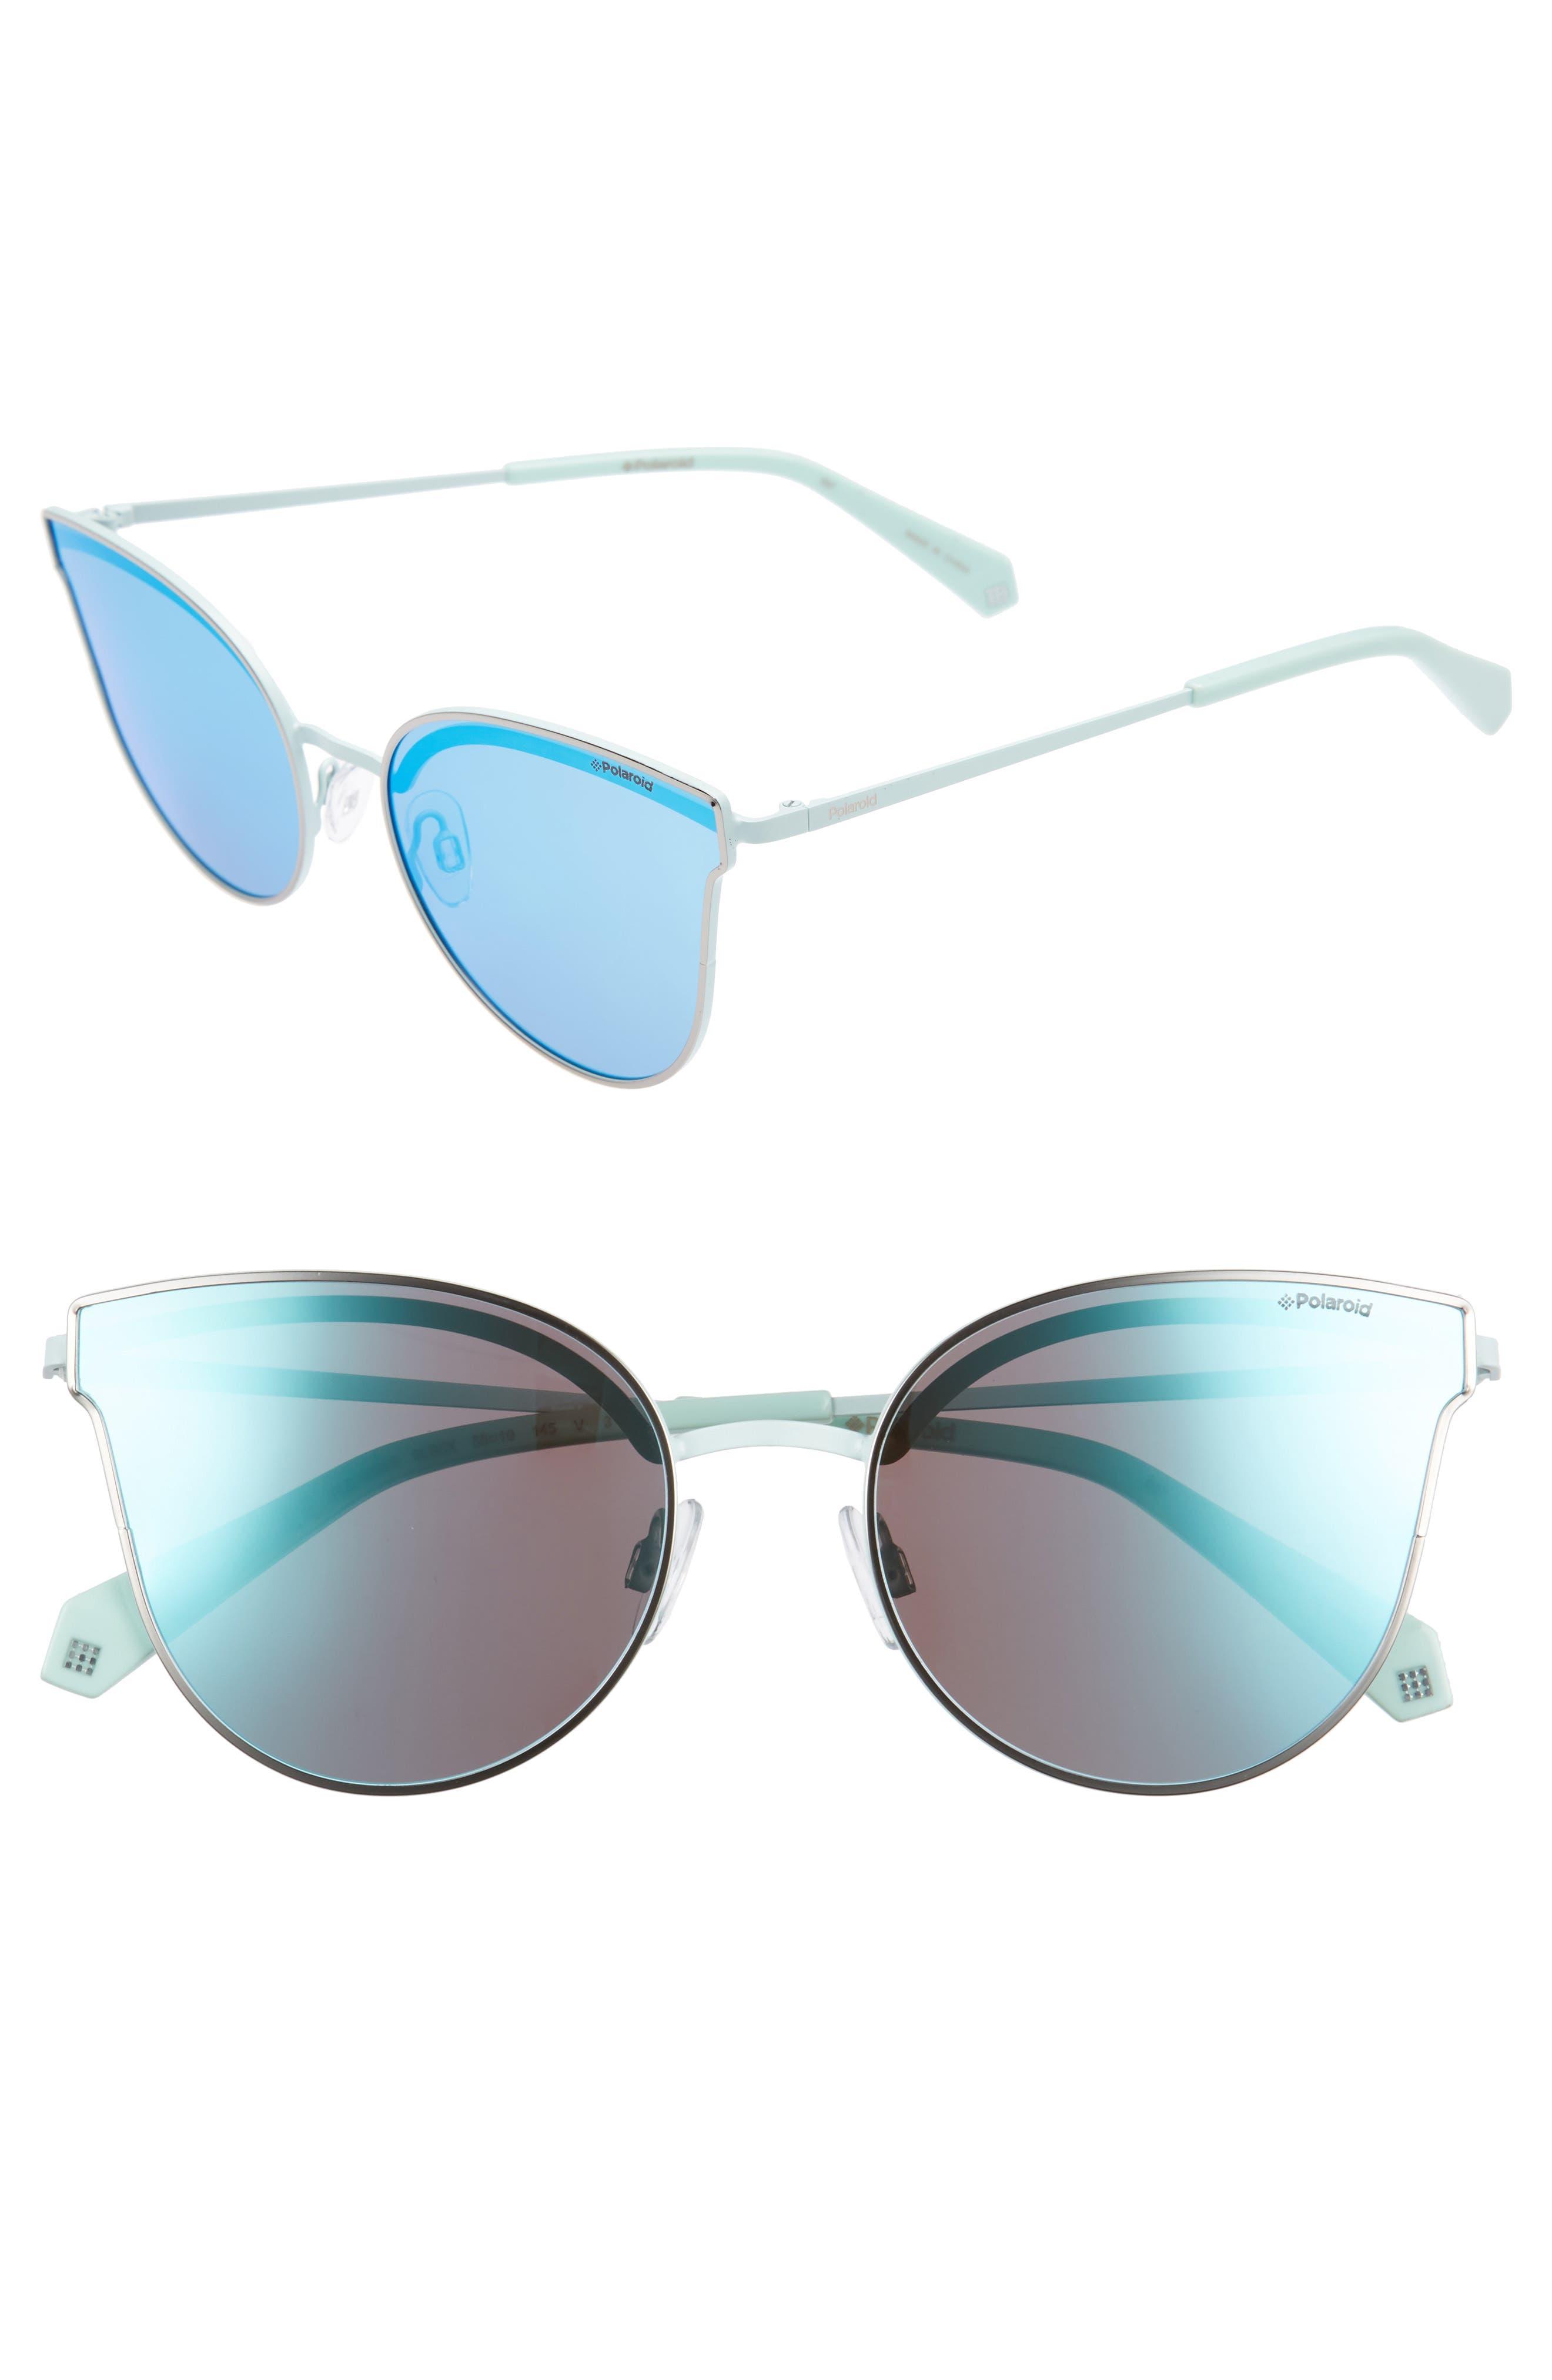 Polaroid 58mm Polarized Butterfly Sunglasses